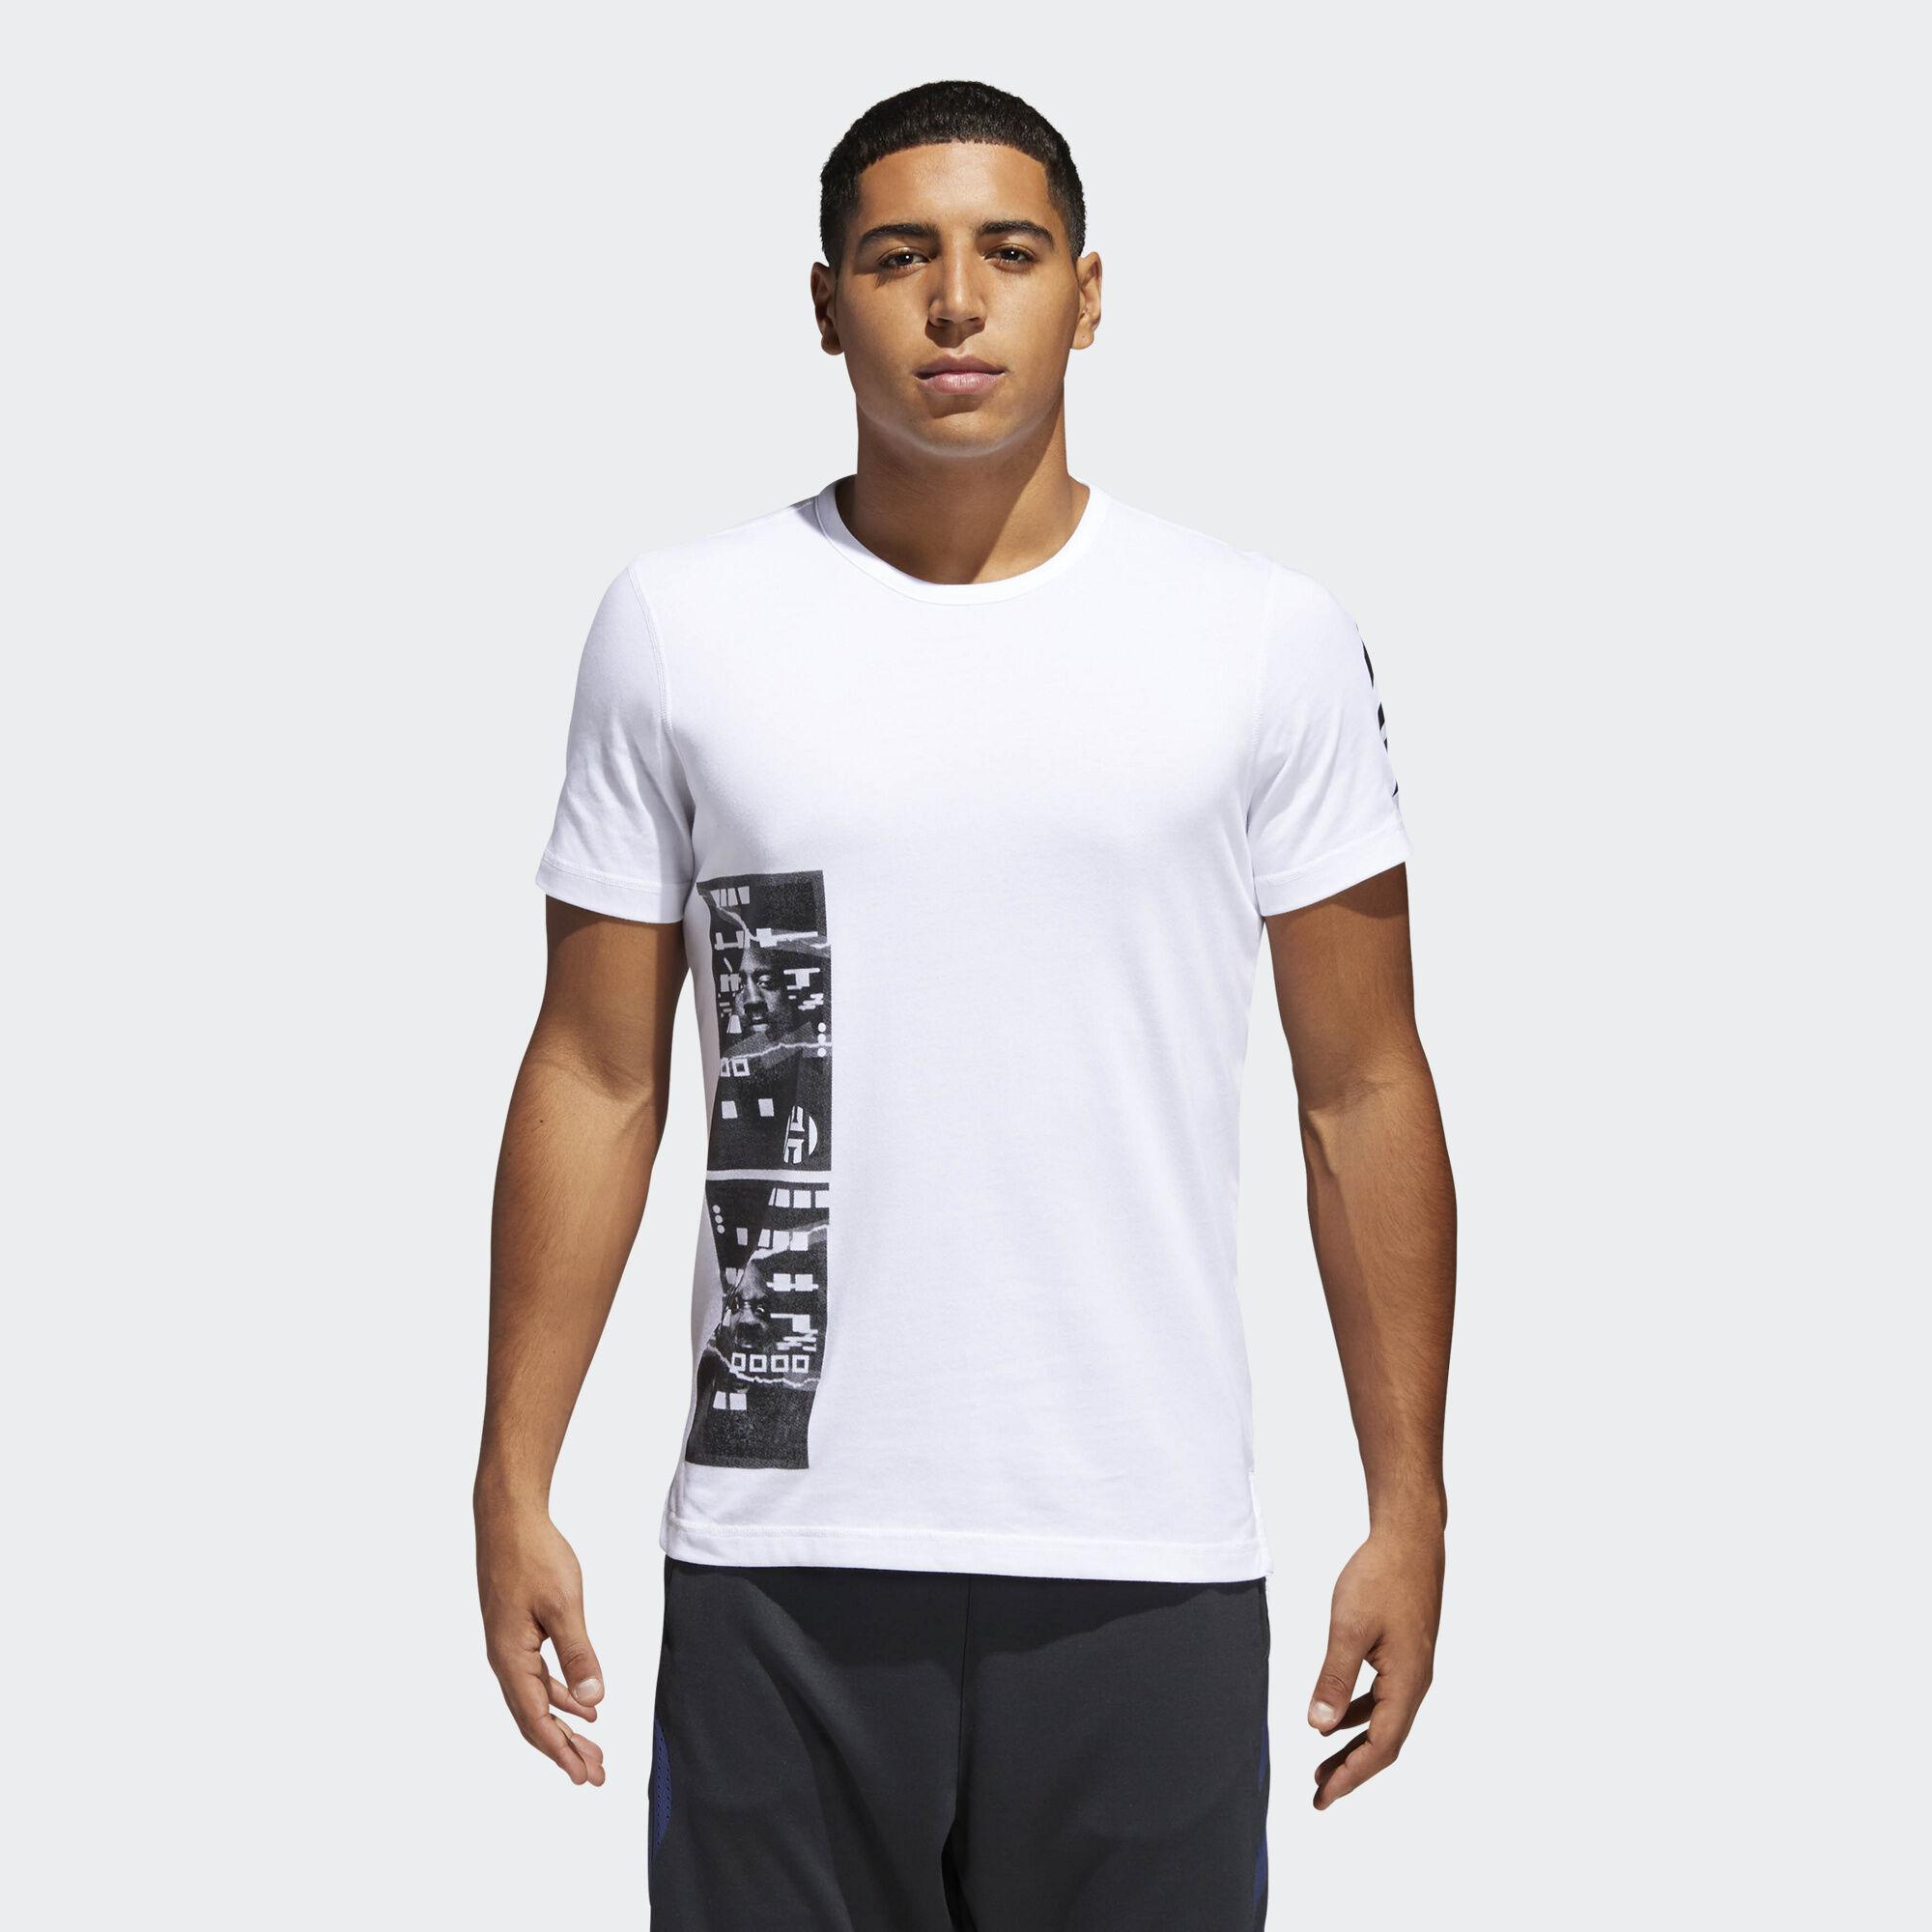 James Harden Date Of Birth: Adidas Harden Tee - White